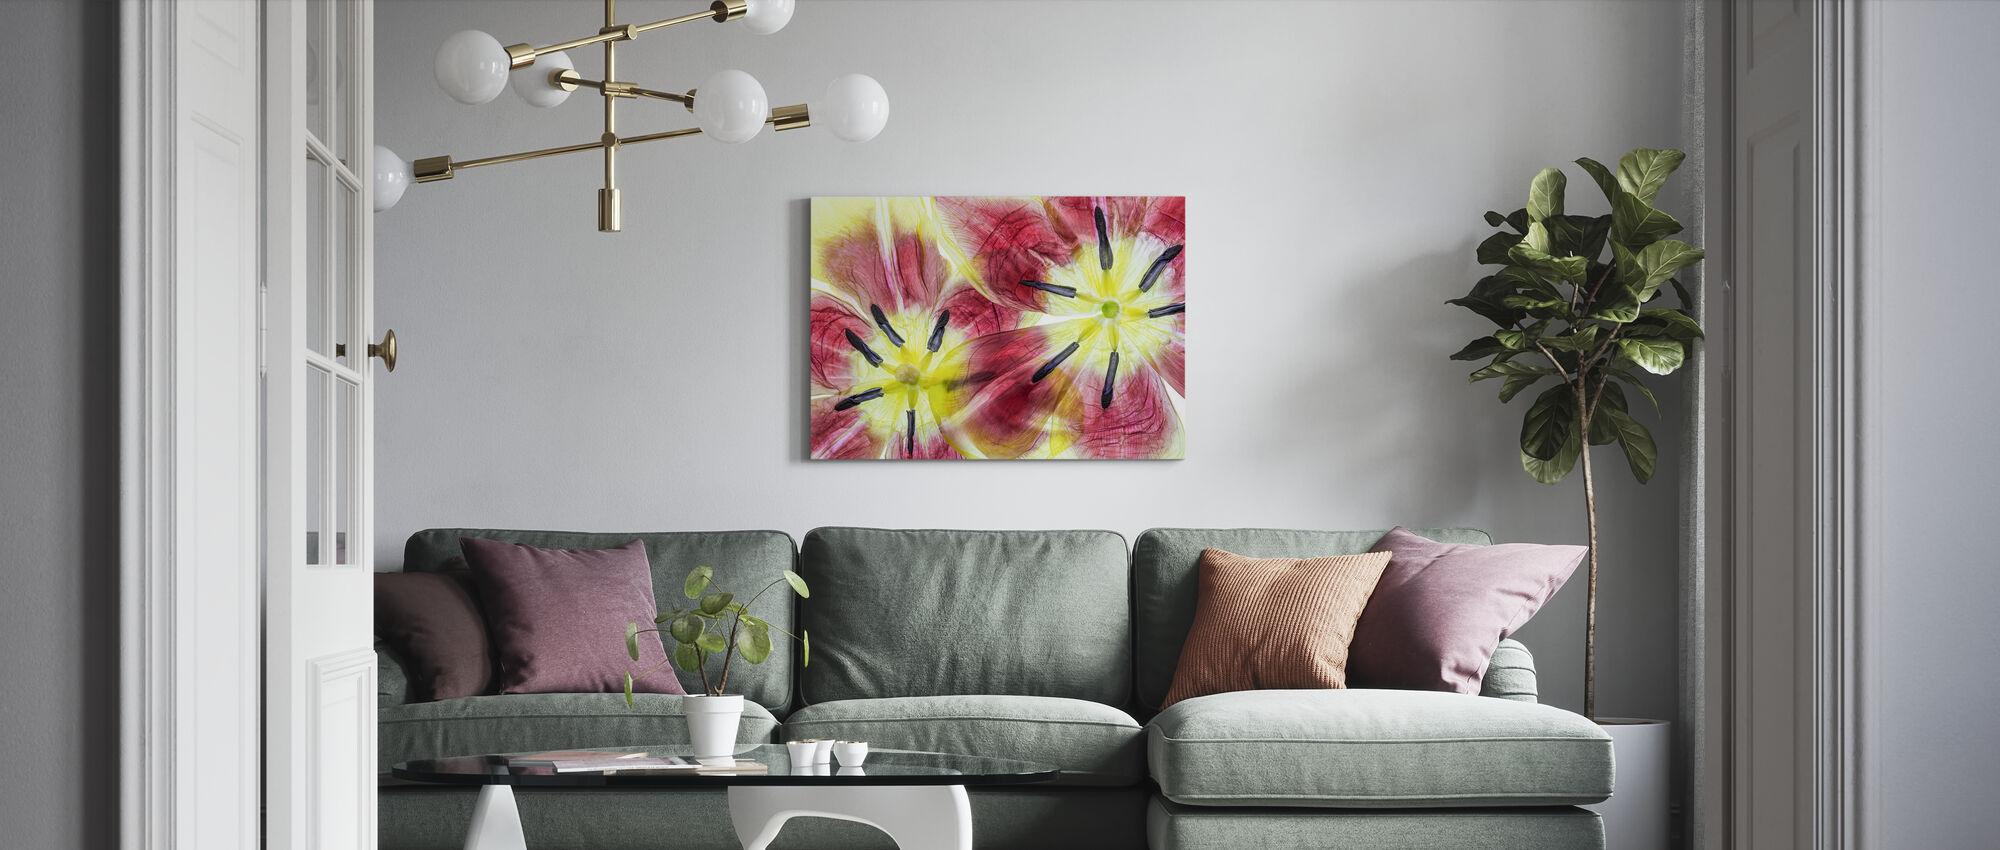 Tulips - Canvas print - Living Room